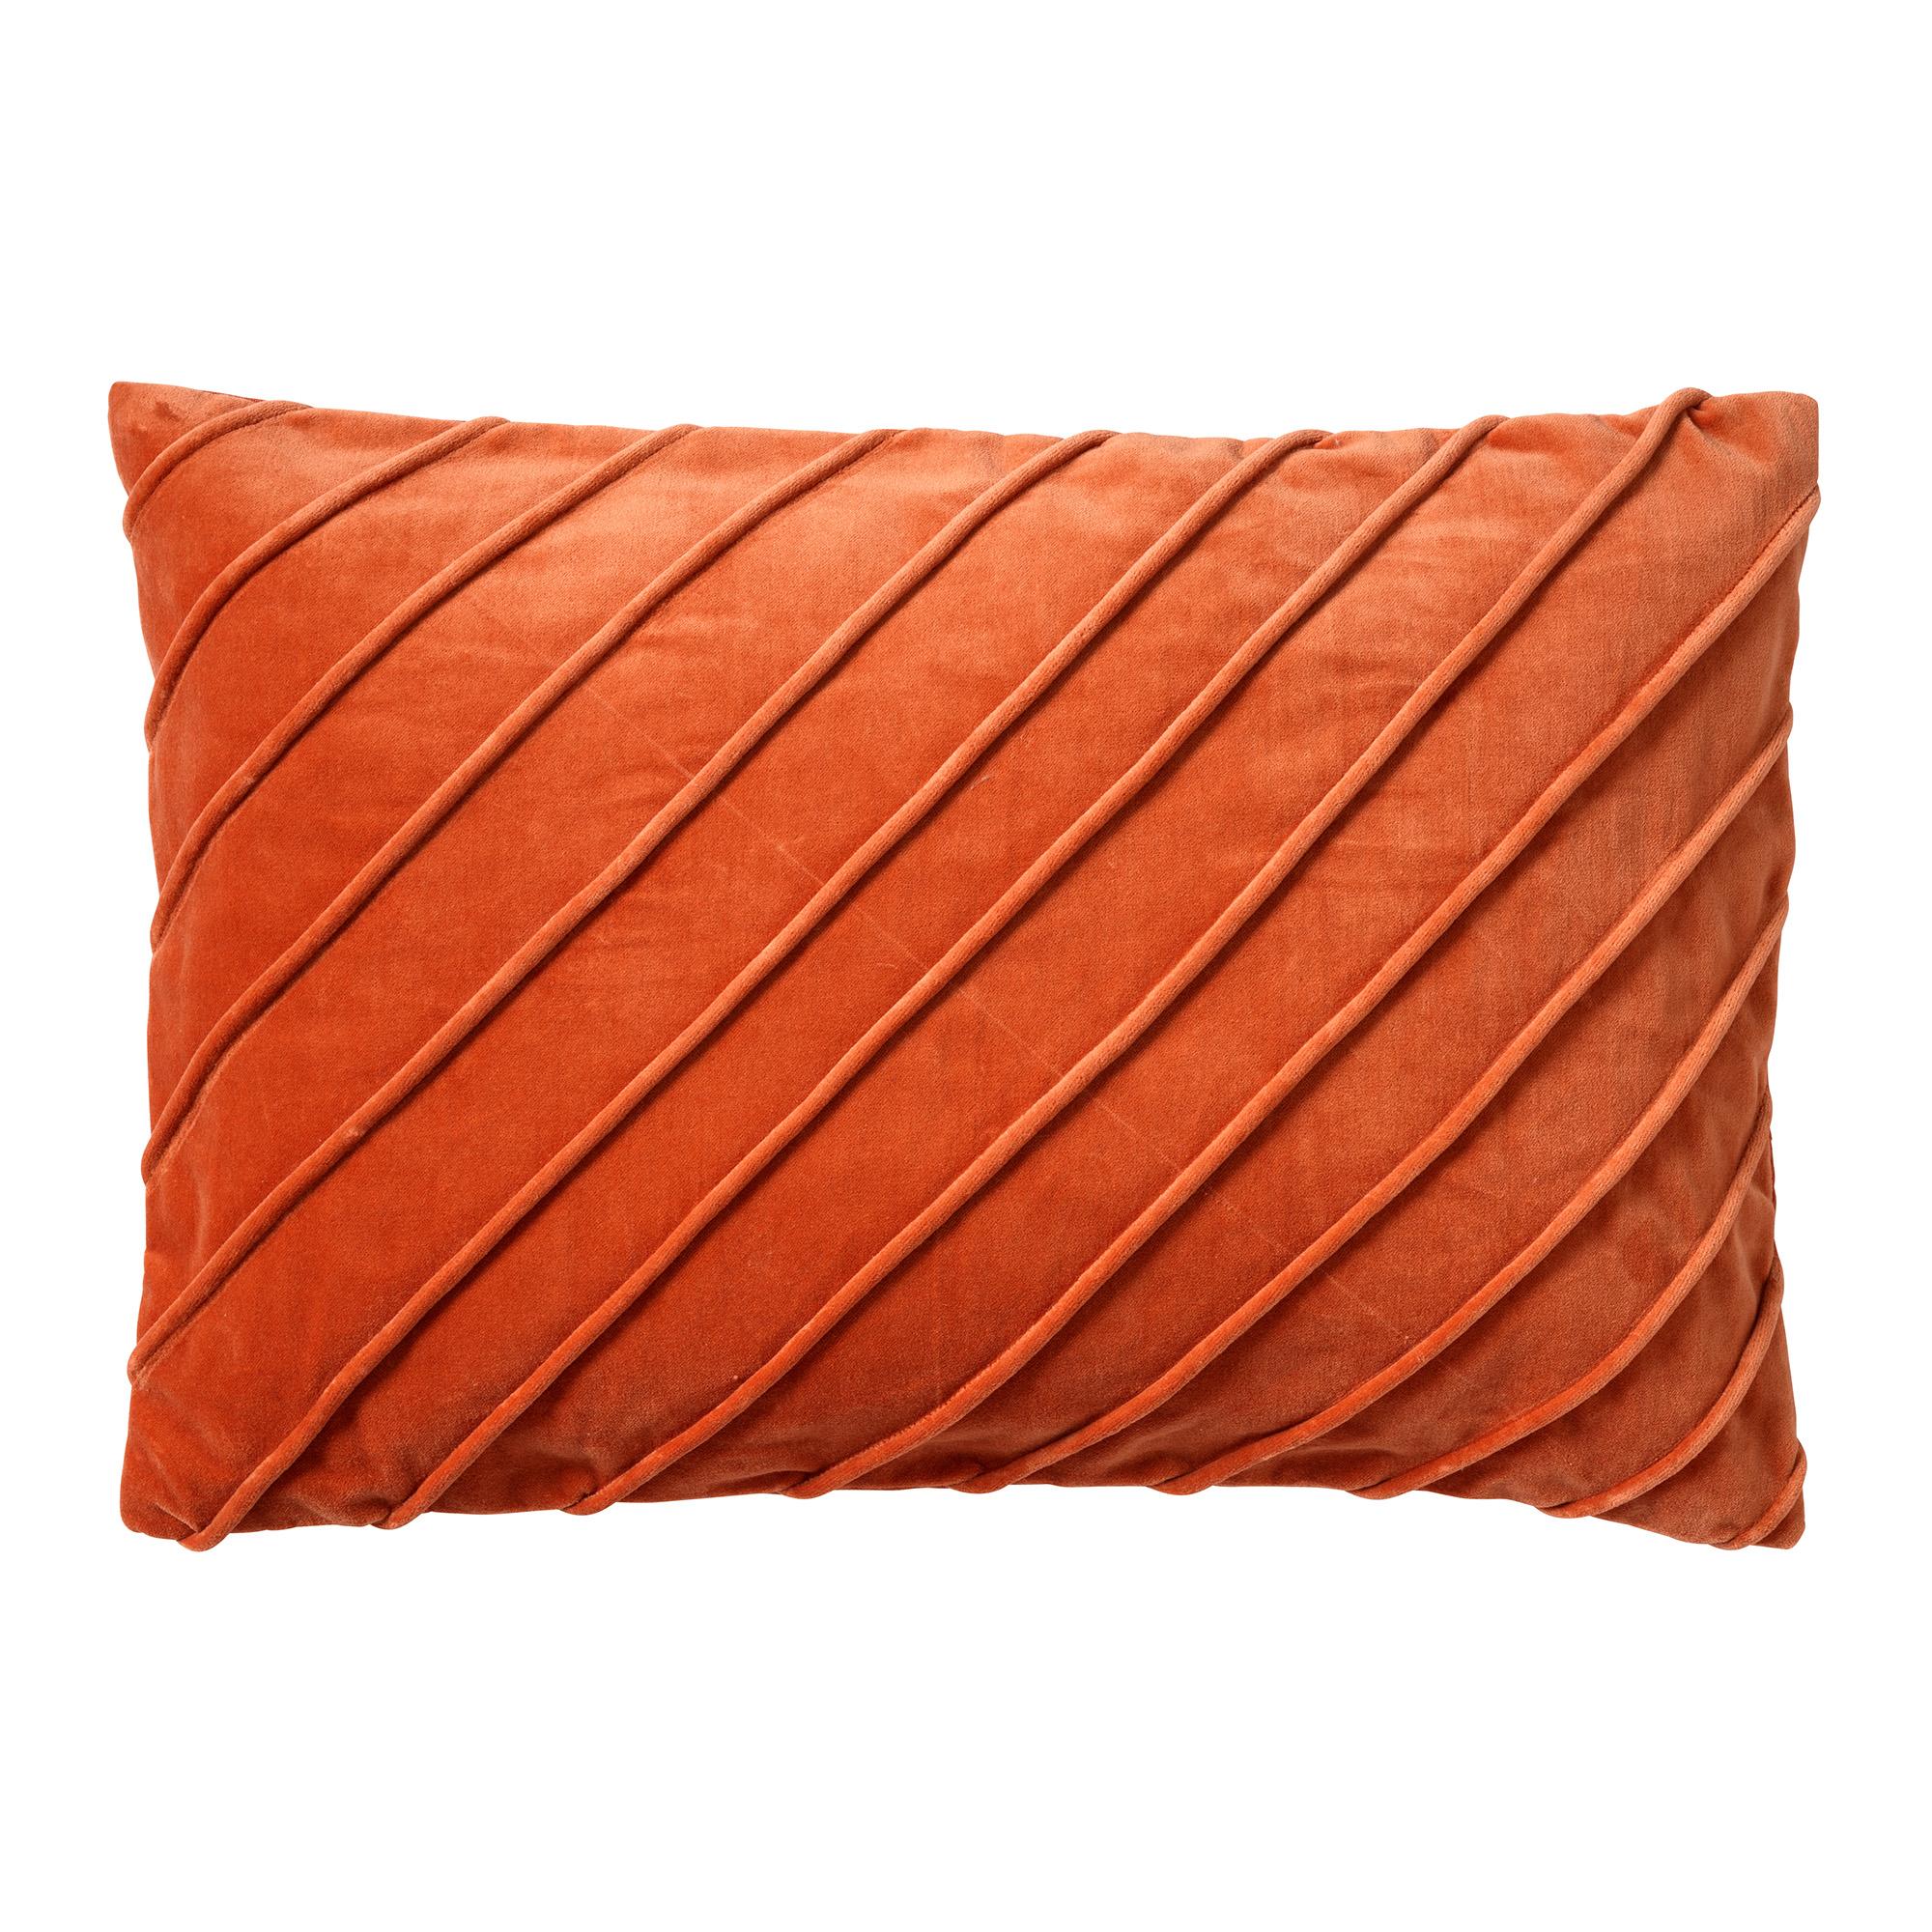 PACO - Kussenhoes velvet 40x60 cm Potters Clay